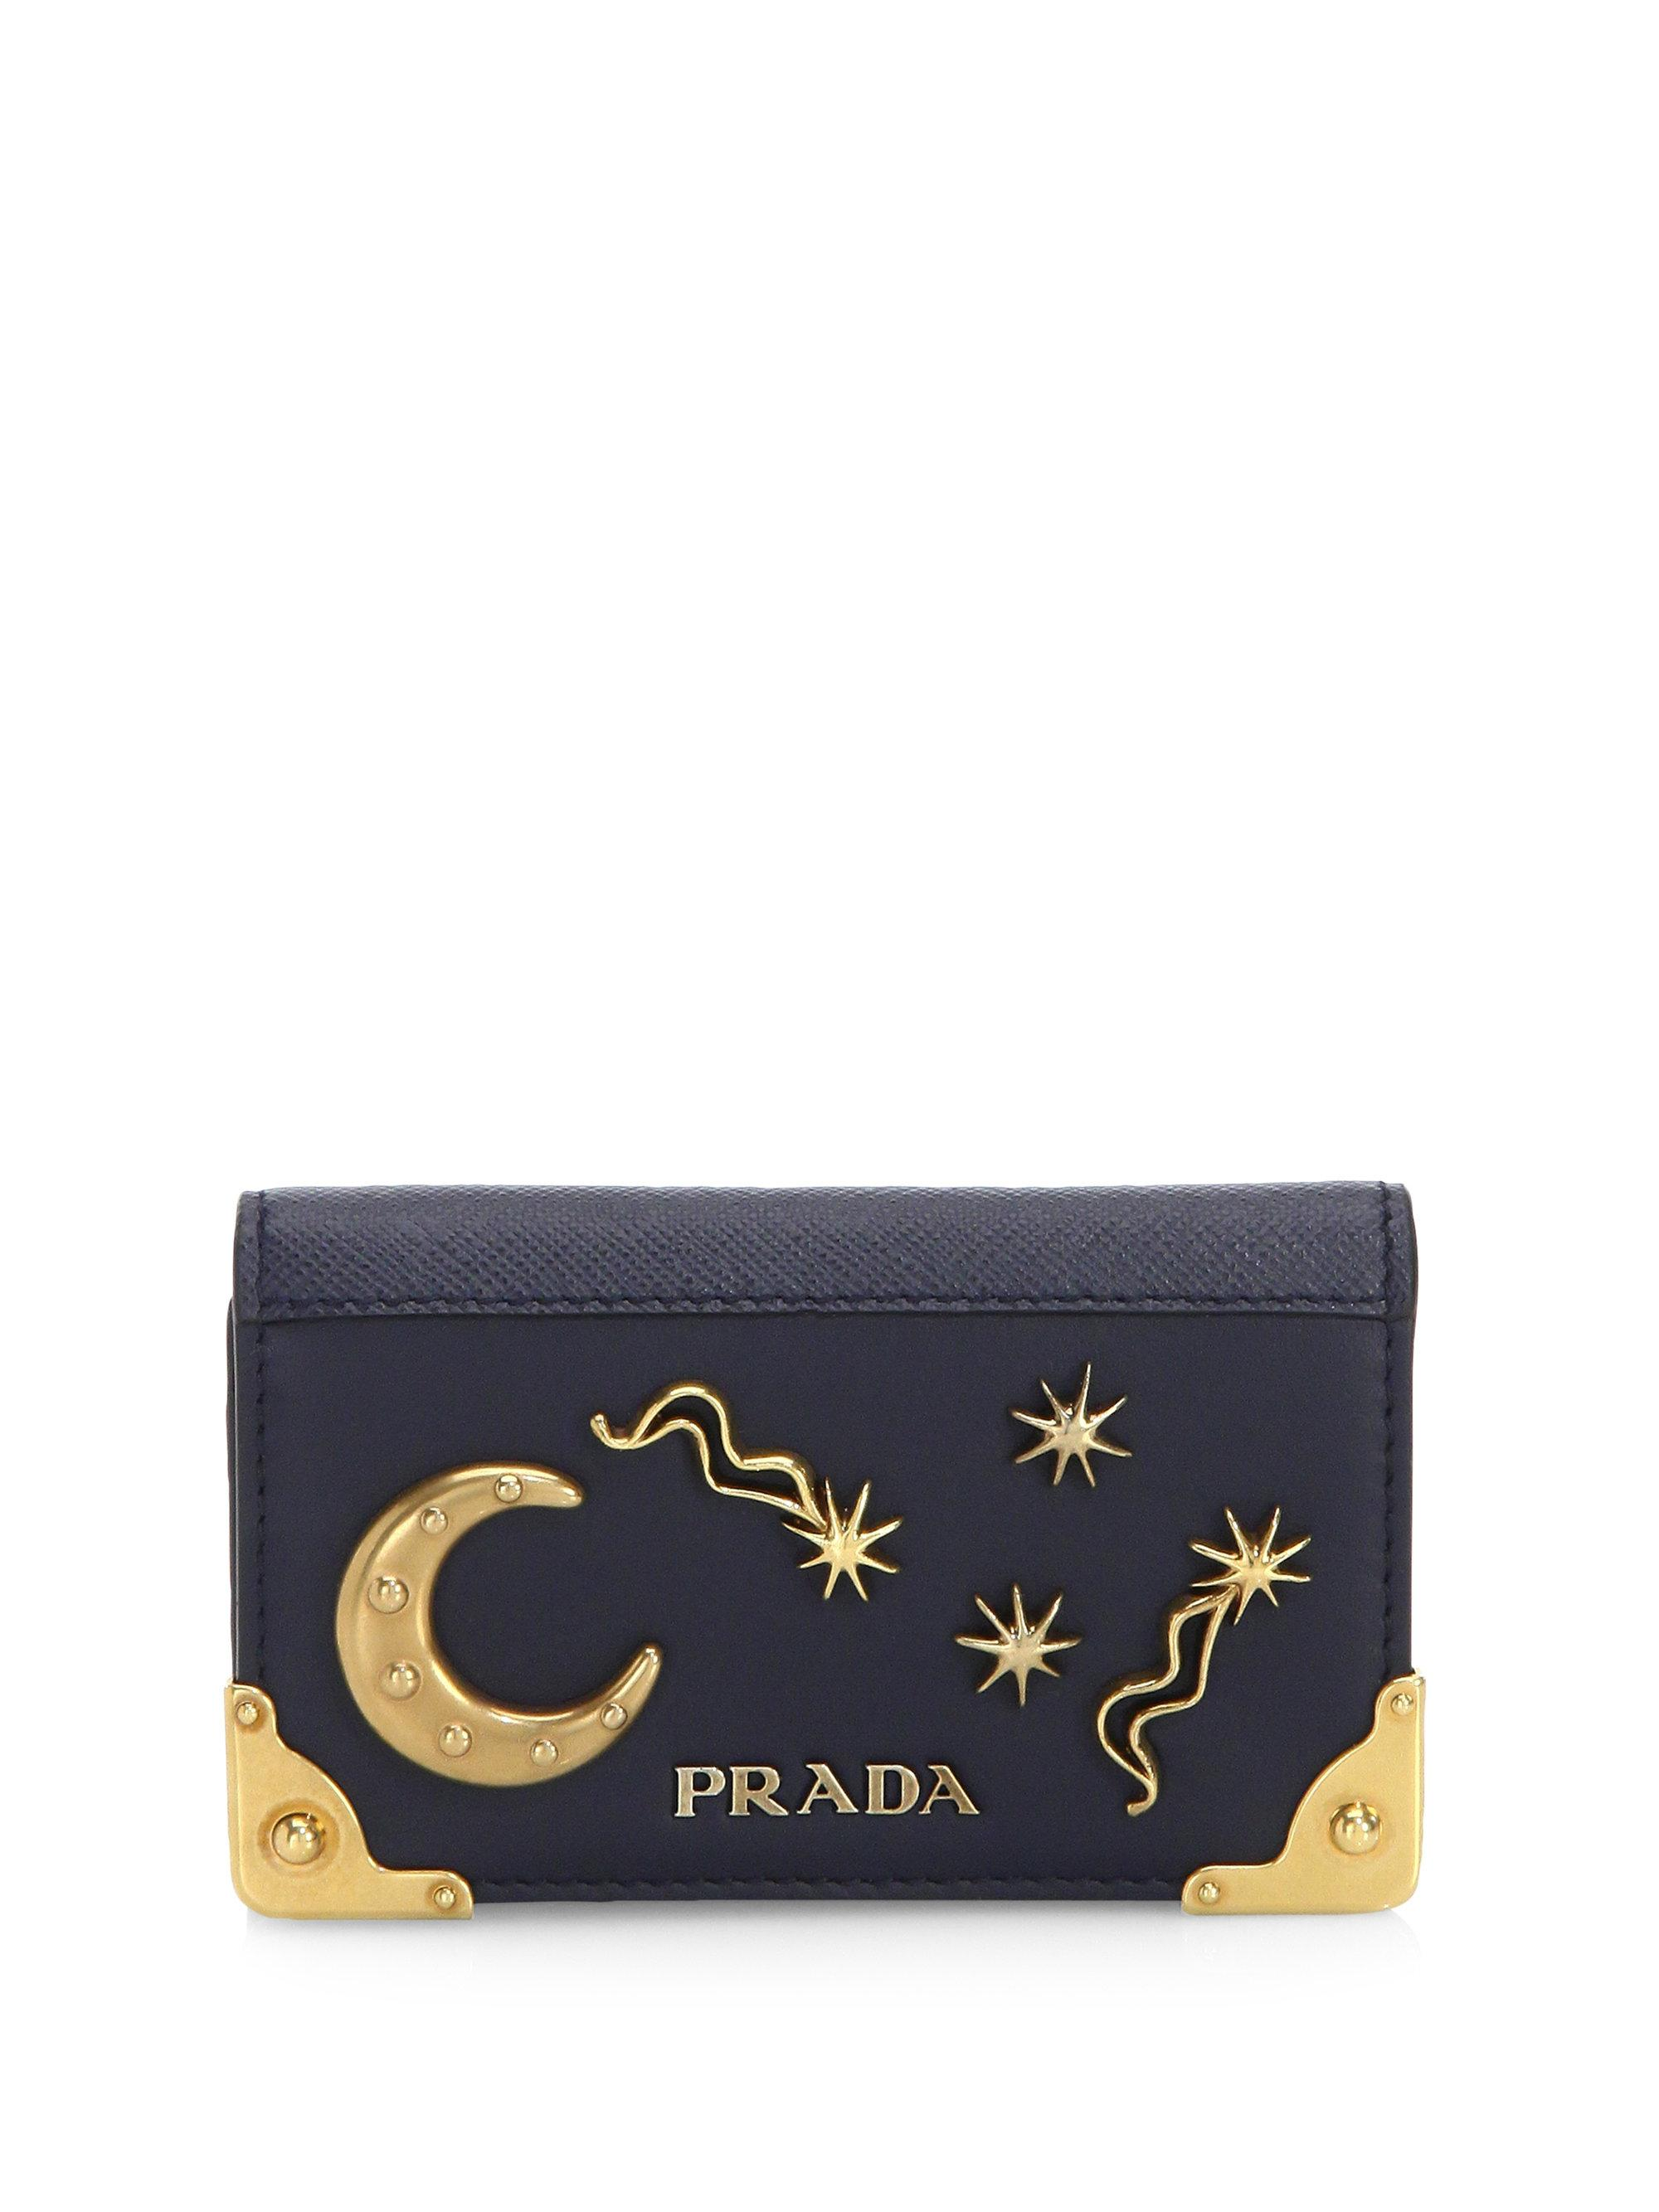 Card Holder Wallet Prada - Famous Wallet 2018